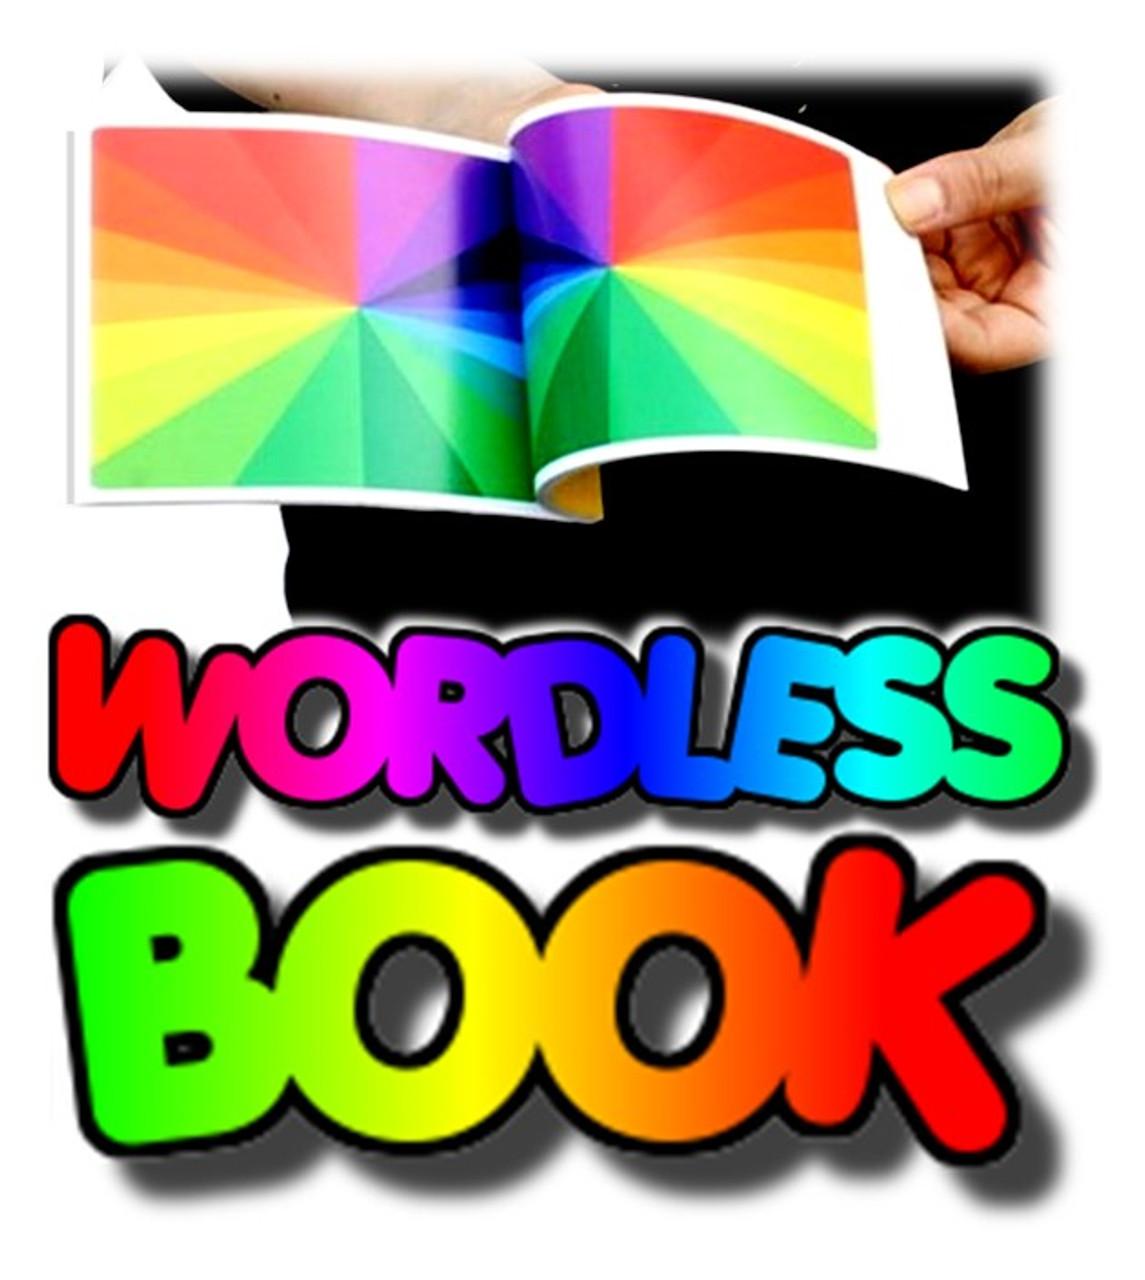 Wordless Book Gospel Magic Trick